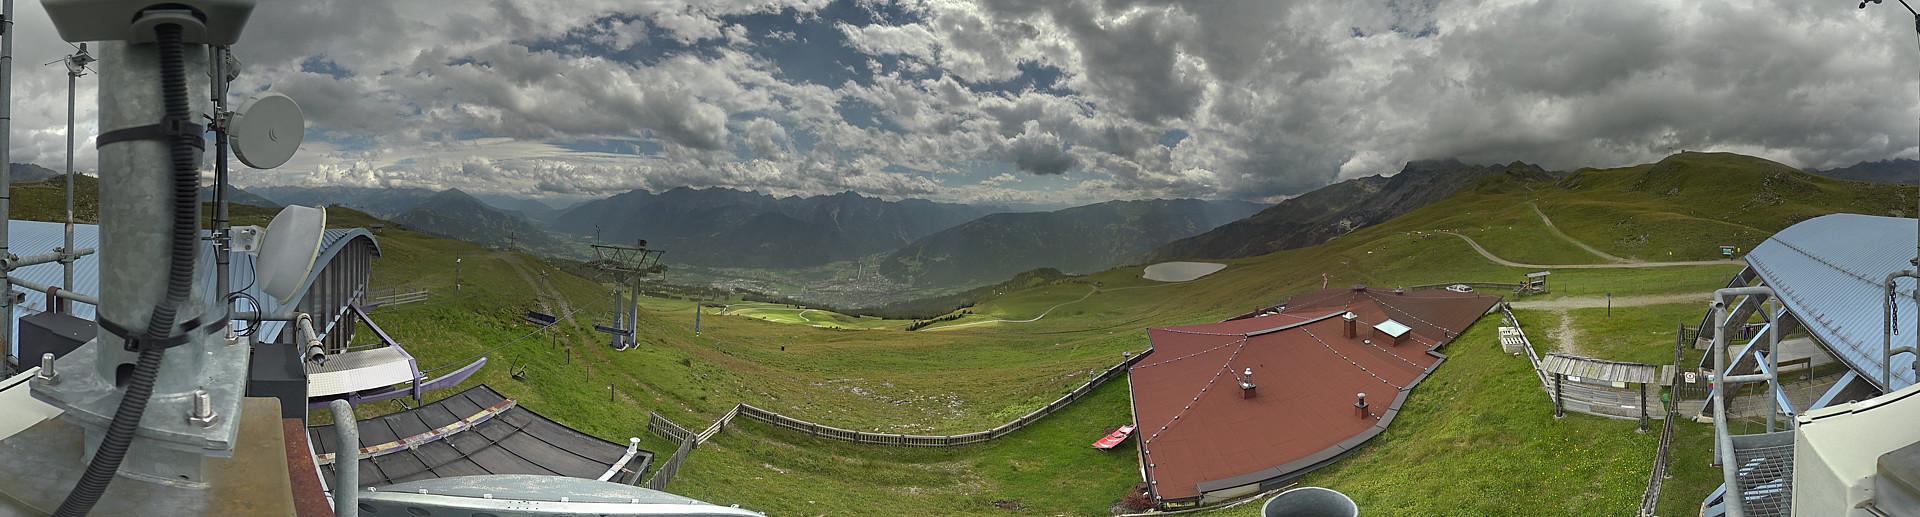 Webcam Zettersfeld - Livebild und Wetter im Skigebiet Lienz